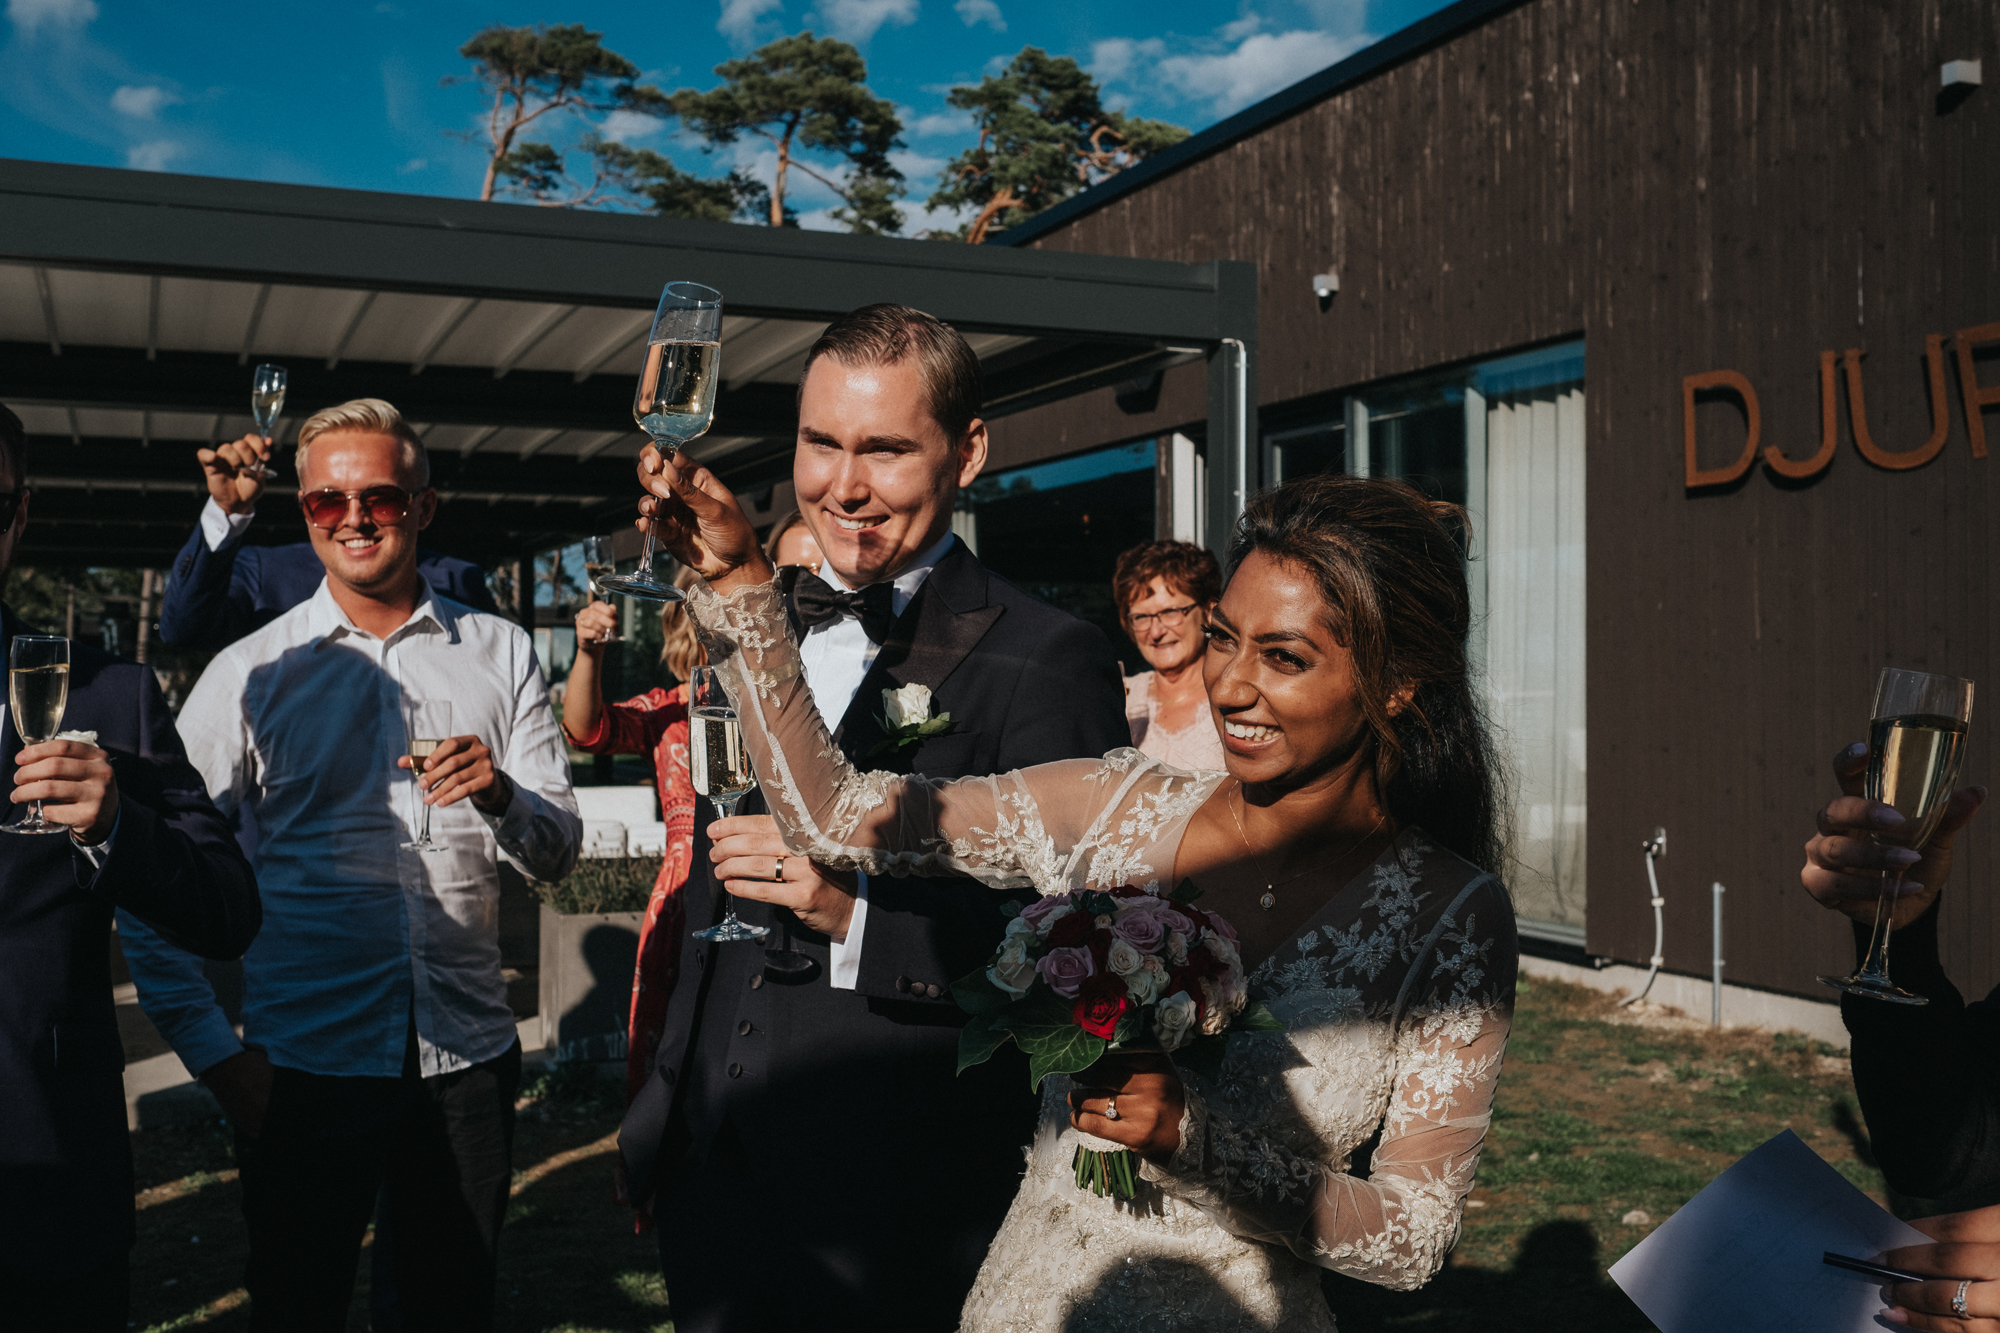 041-bröllop-djupvik-neas-fotografi.jpg